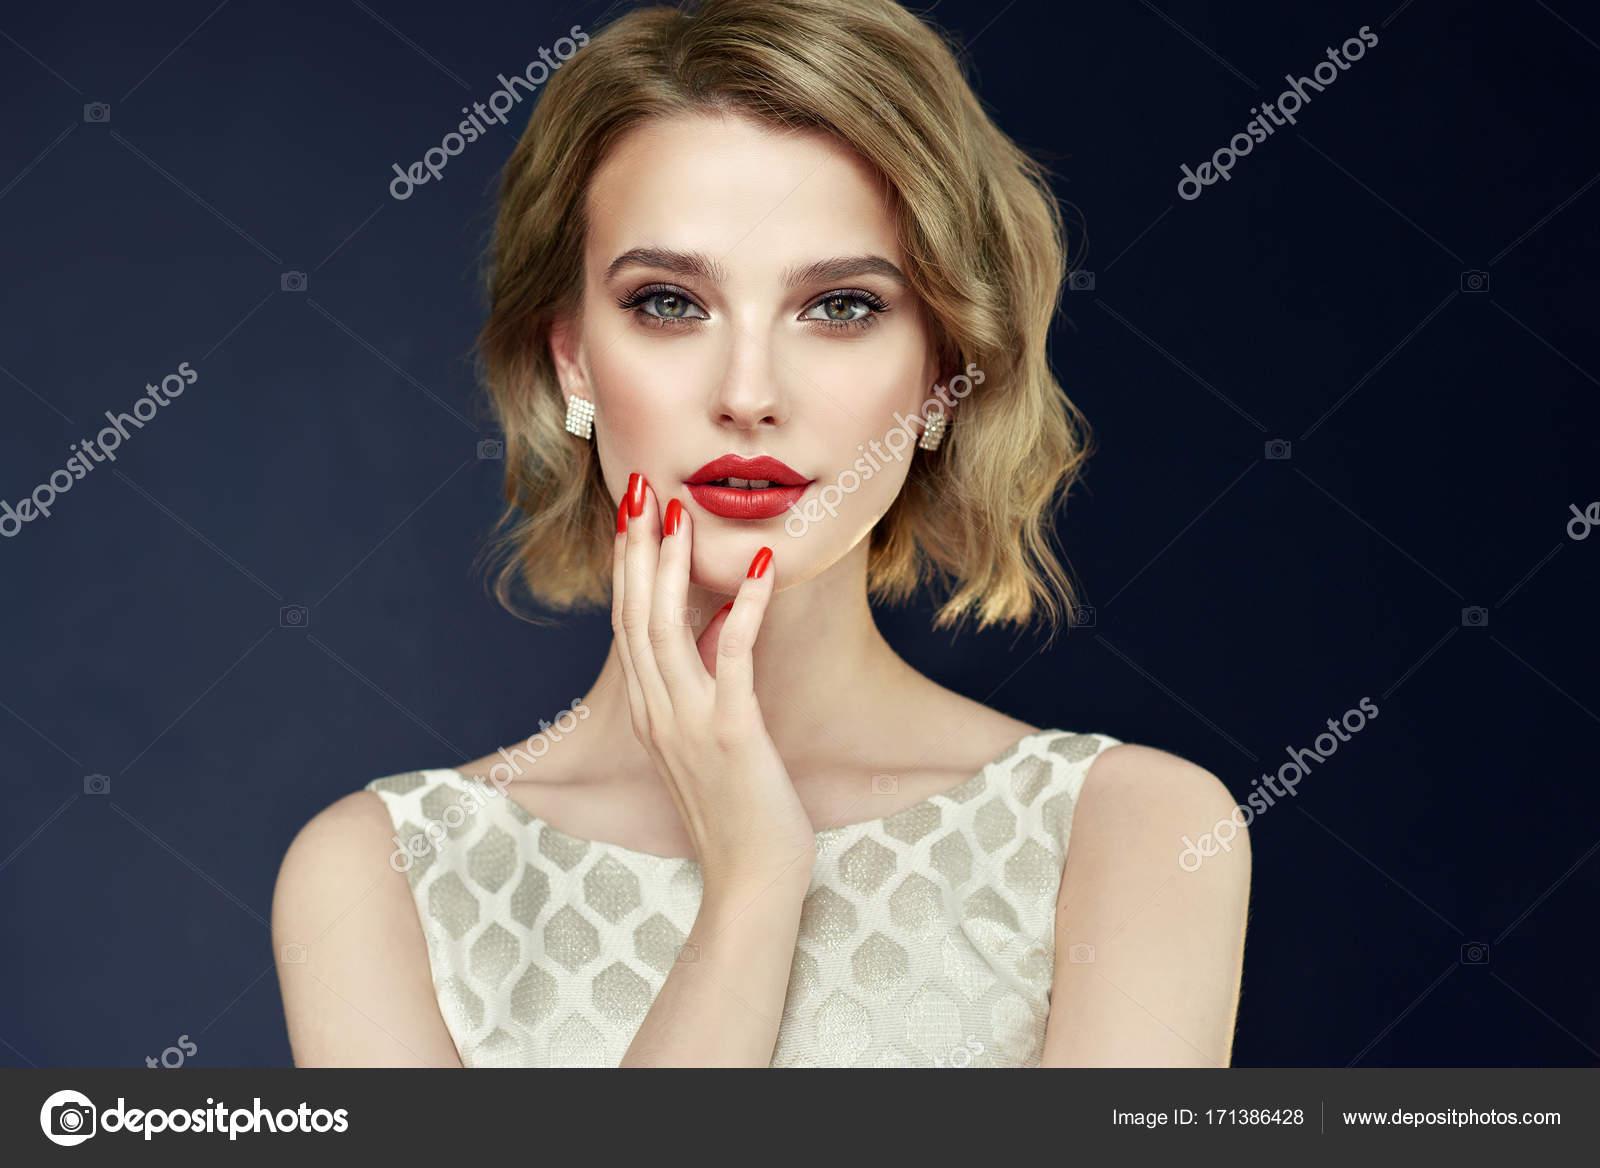 Girl With Short Wavy Hair Stock Photo C Sofia Zhuravets 171386428